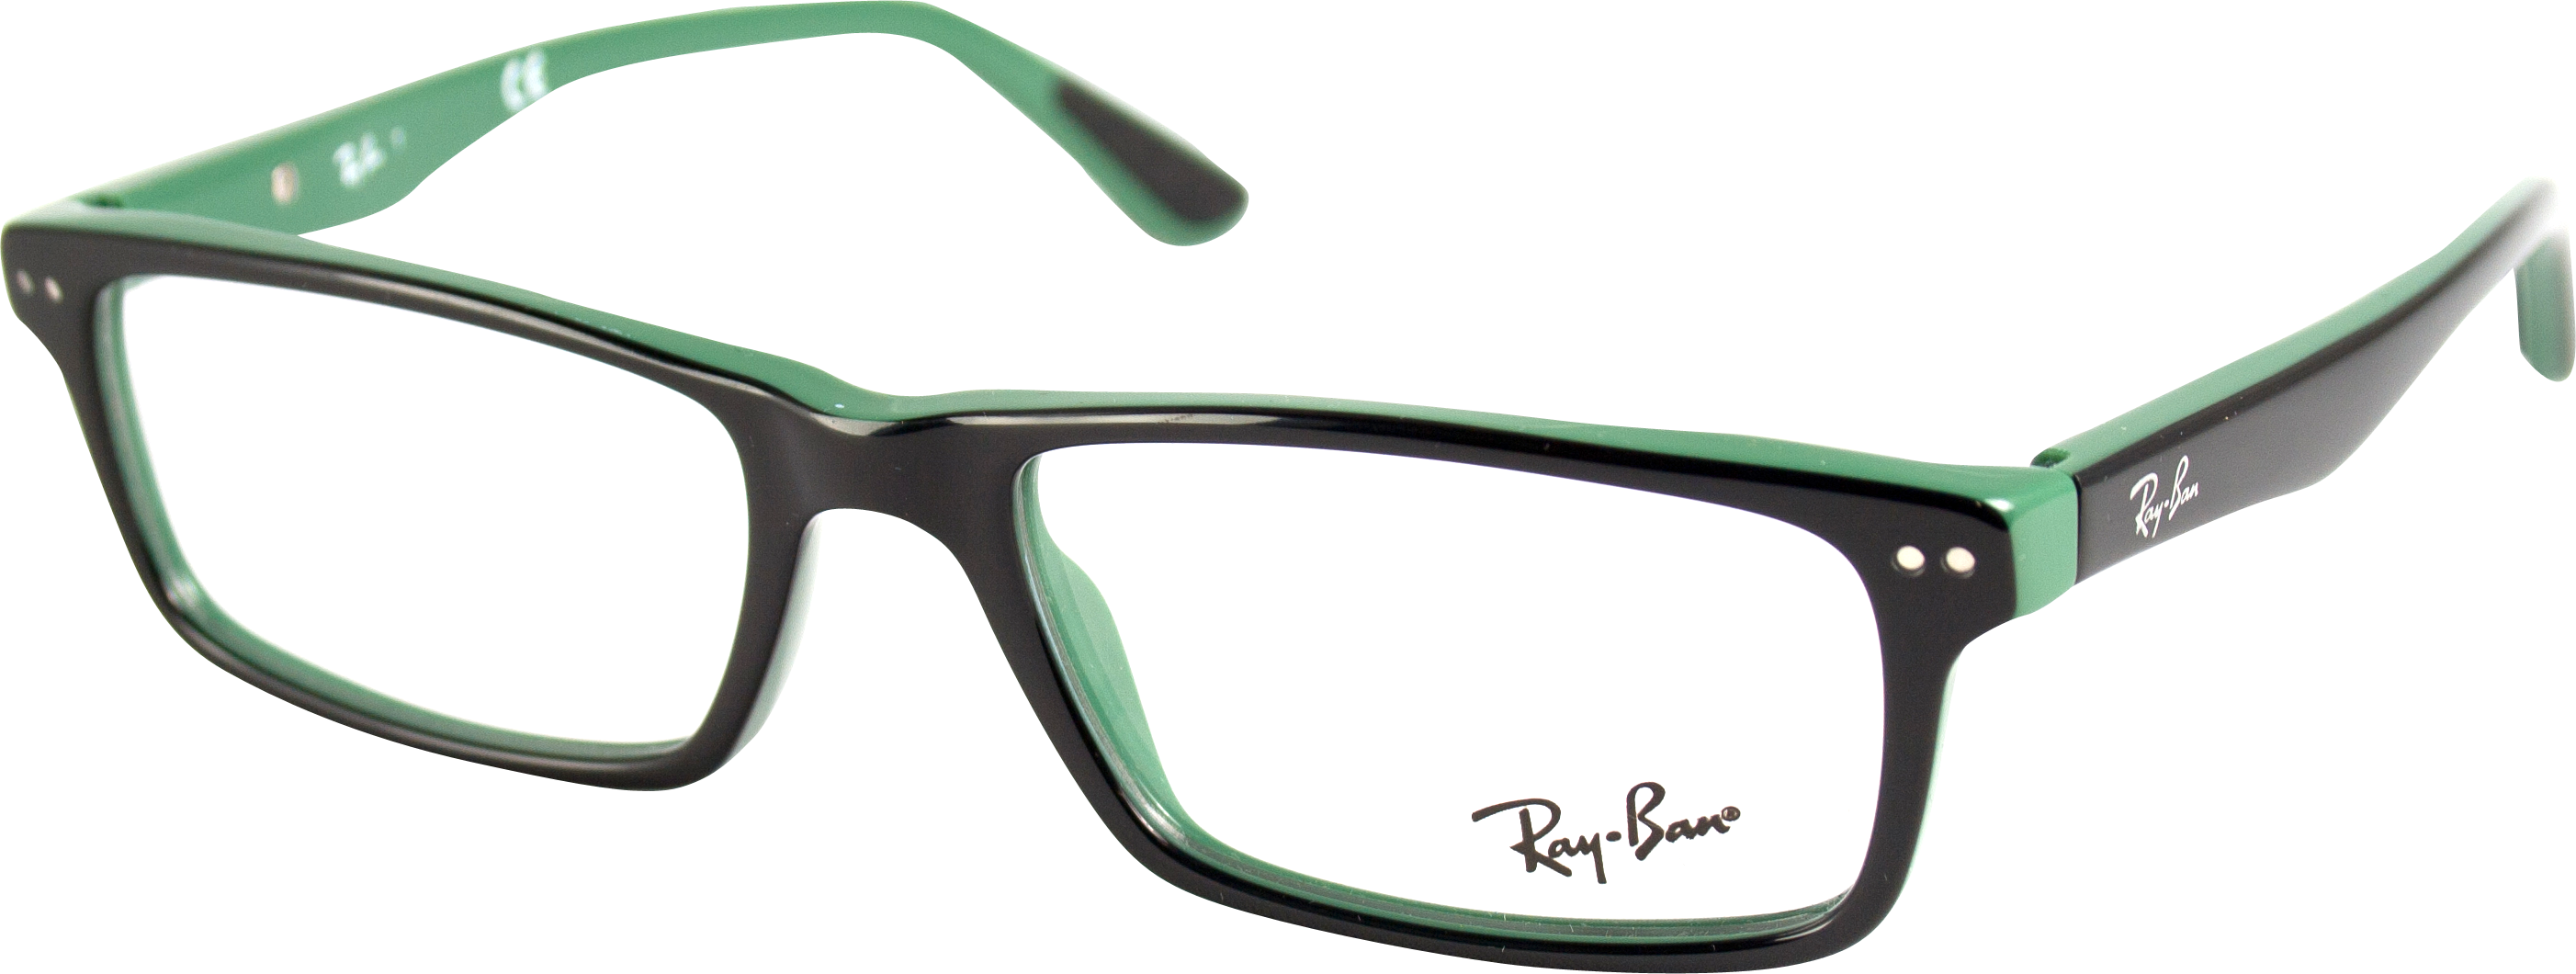 ray ban brillen kinderbrillen hypnosecoach. Black Bedroom Furniture Sets. Home Design Ideas